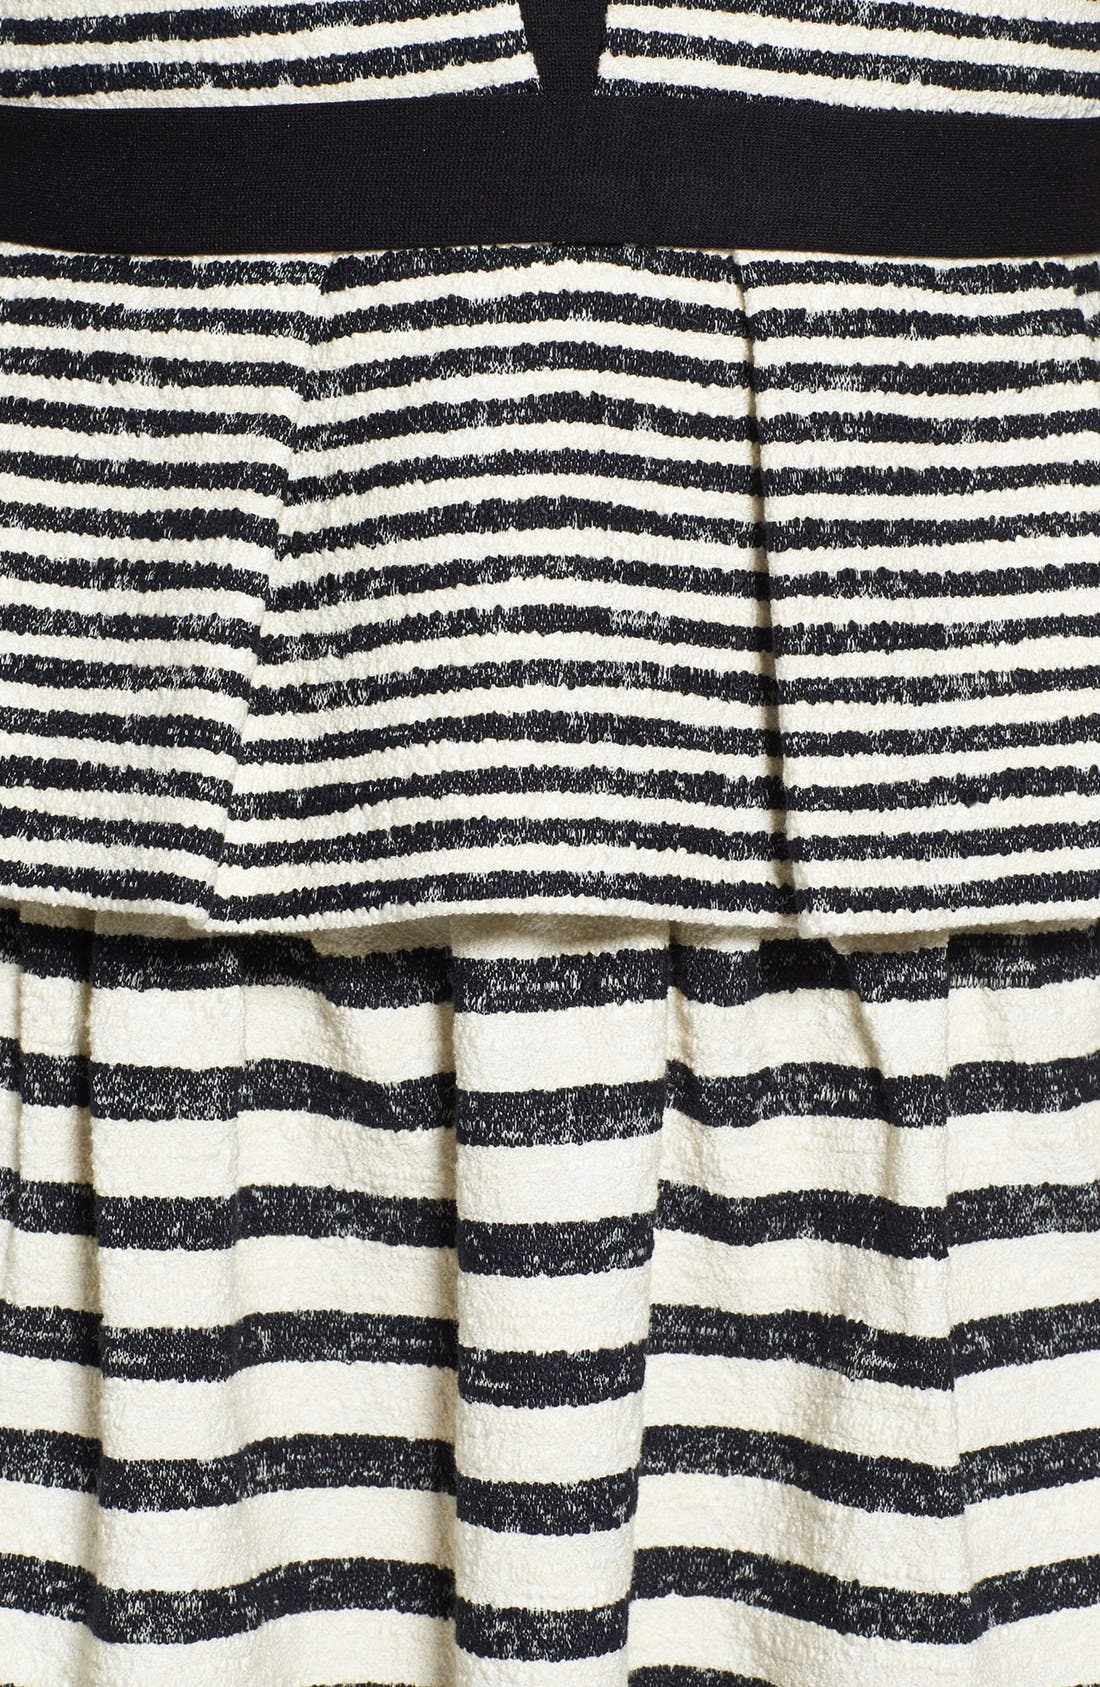 Stripe Fit & Flare Peplum Dress,                             Alternate thumbnail 3, color,                             Black/ Off White Combo